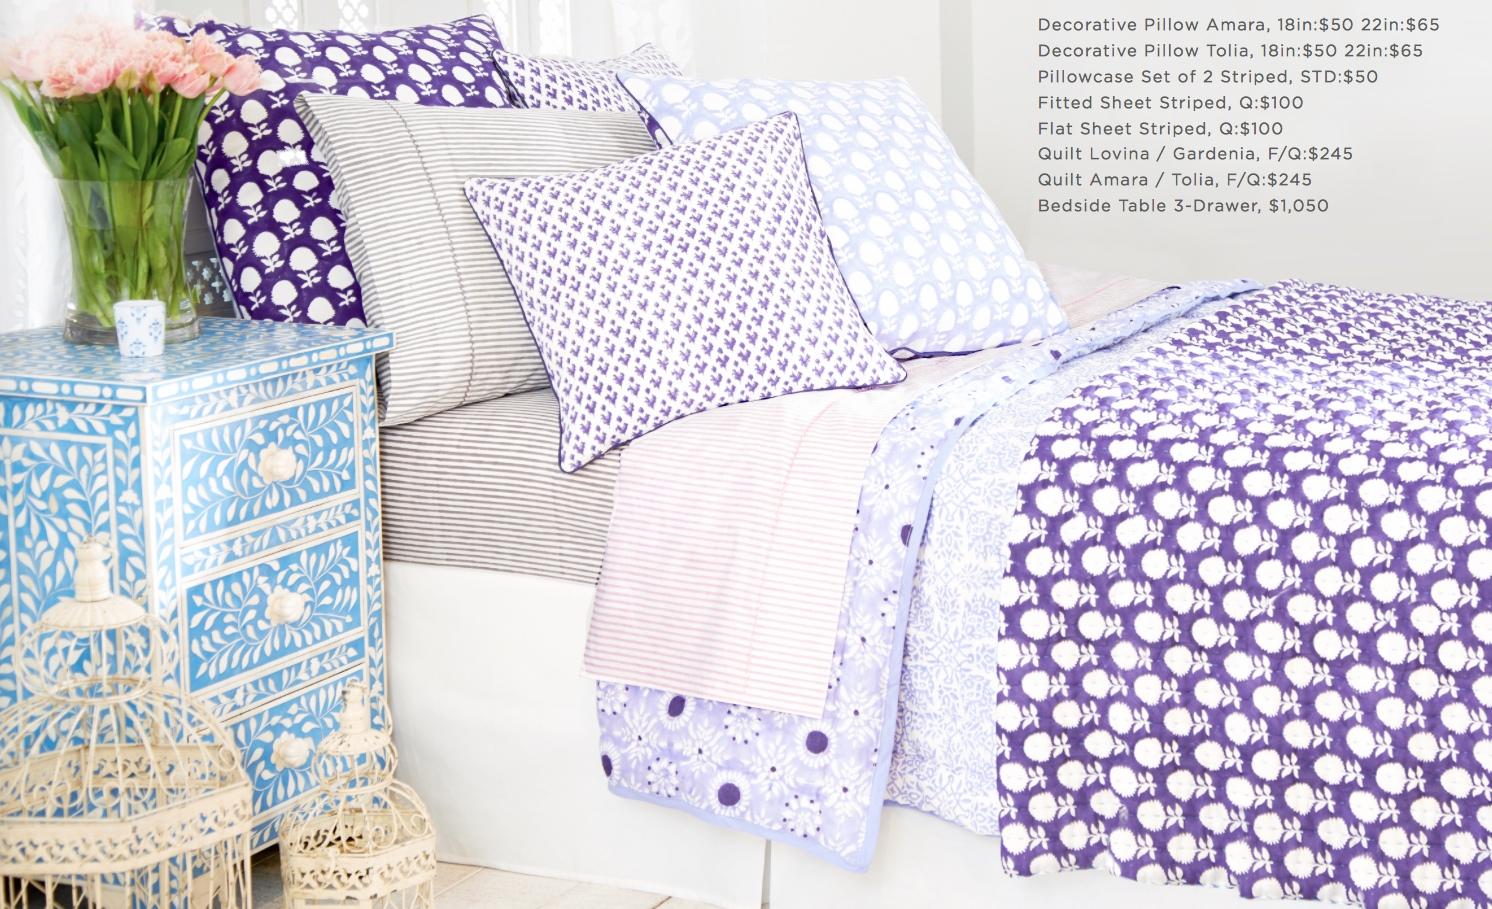 Roberta Roller Rabbit's New Bedding Collection Sings Spring In The ... : roberta roller rabbit quilts - Adamdwight.com